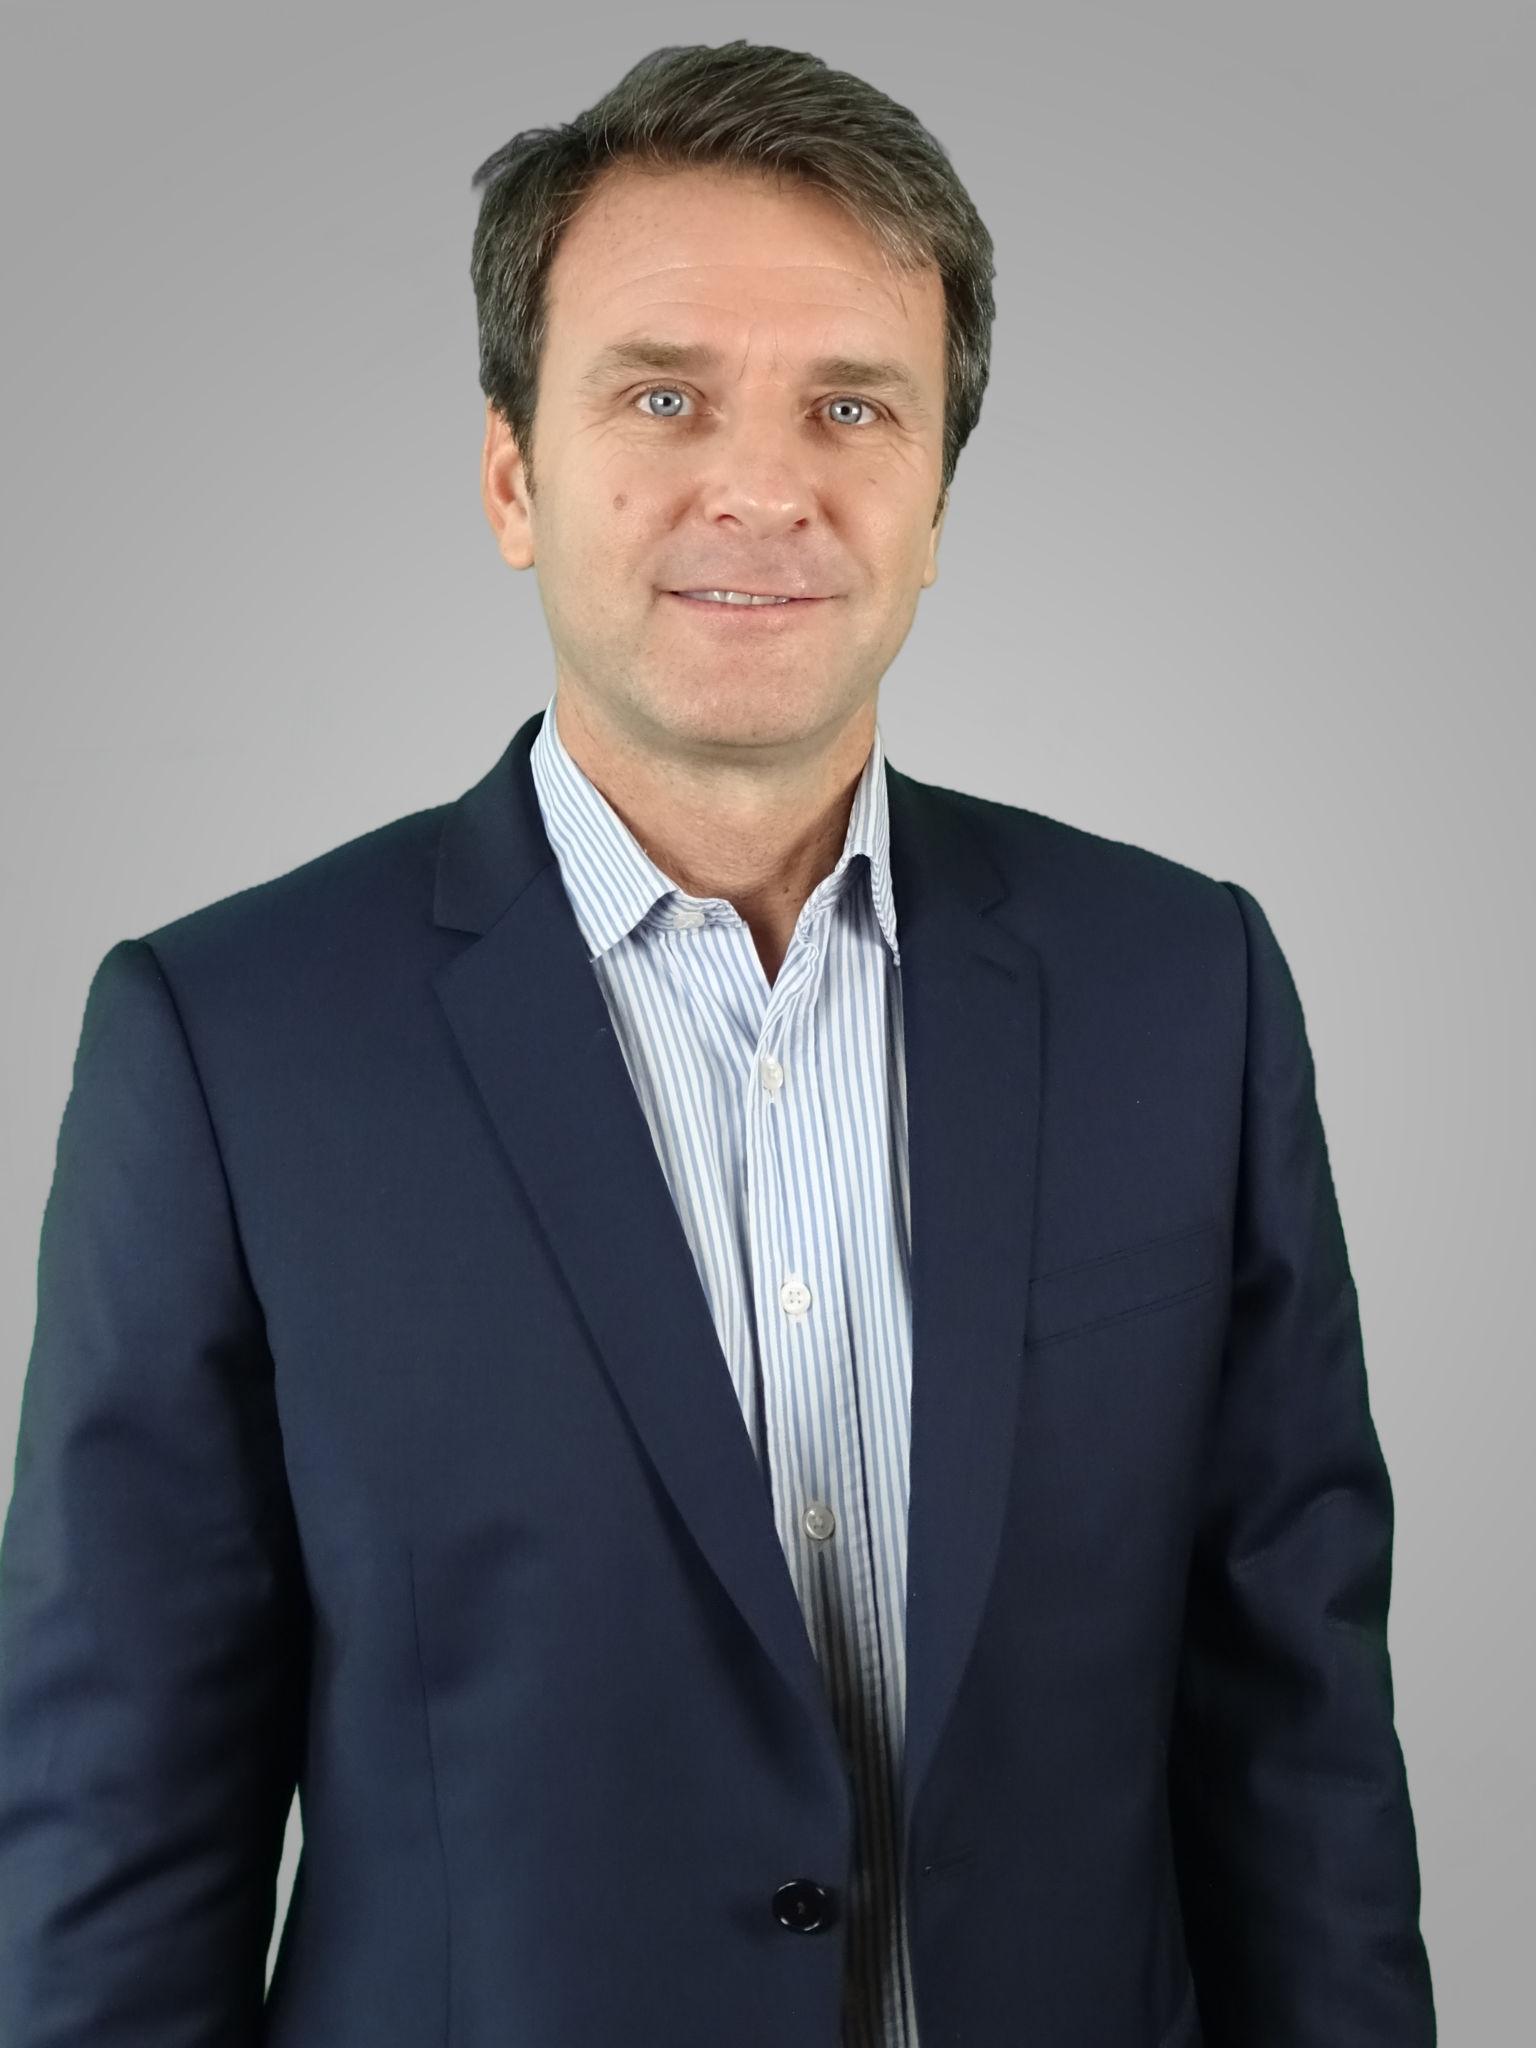 alexandre-fedoroff-groupe-bsl-securite-entreprise-gardiennage-ile-de-france